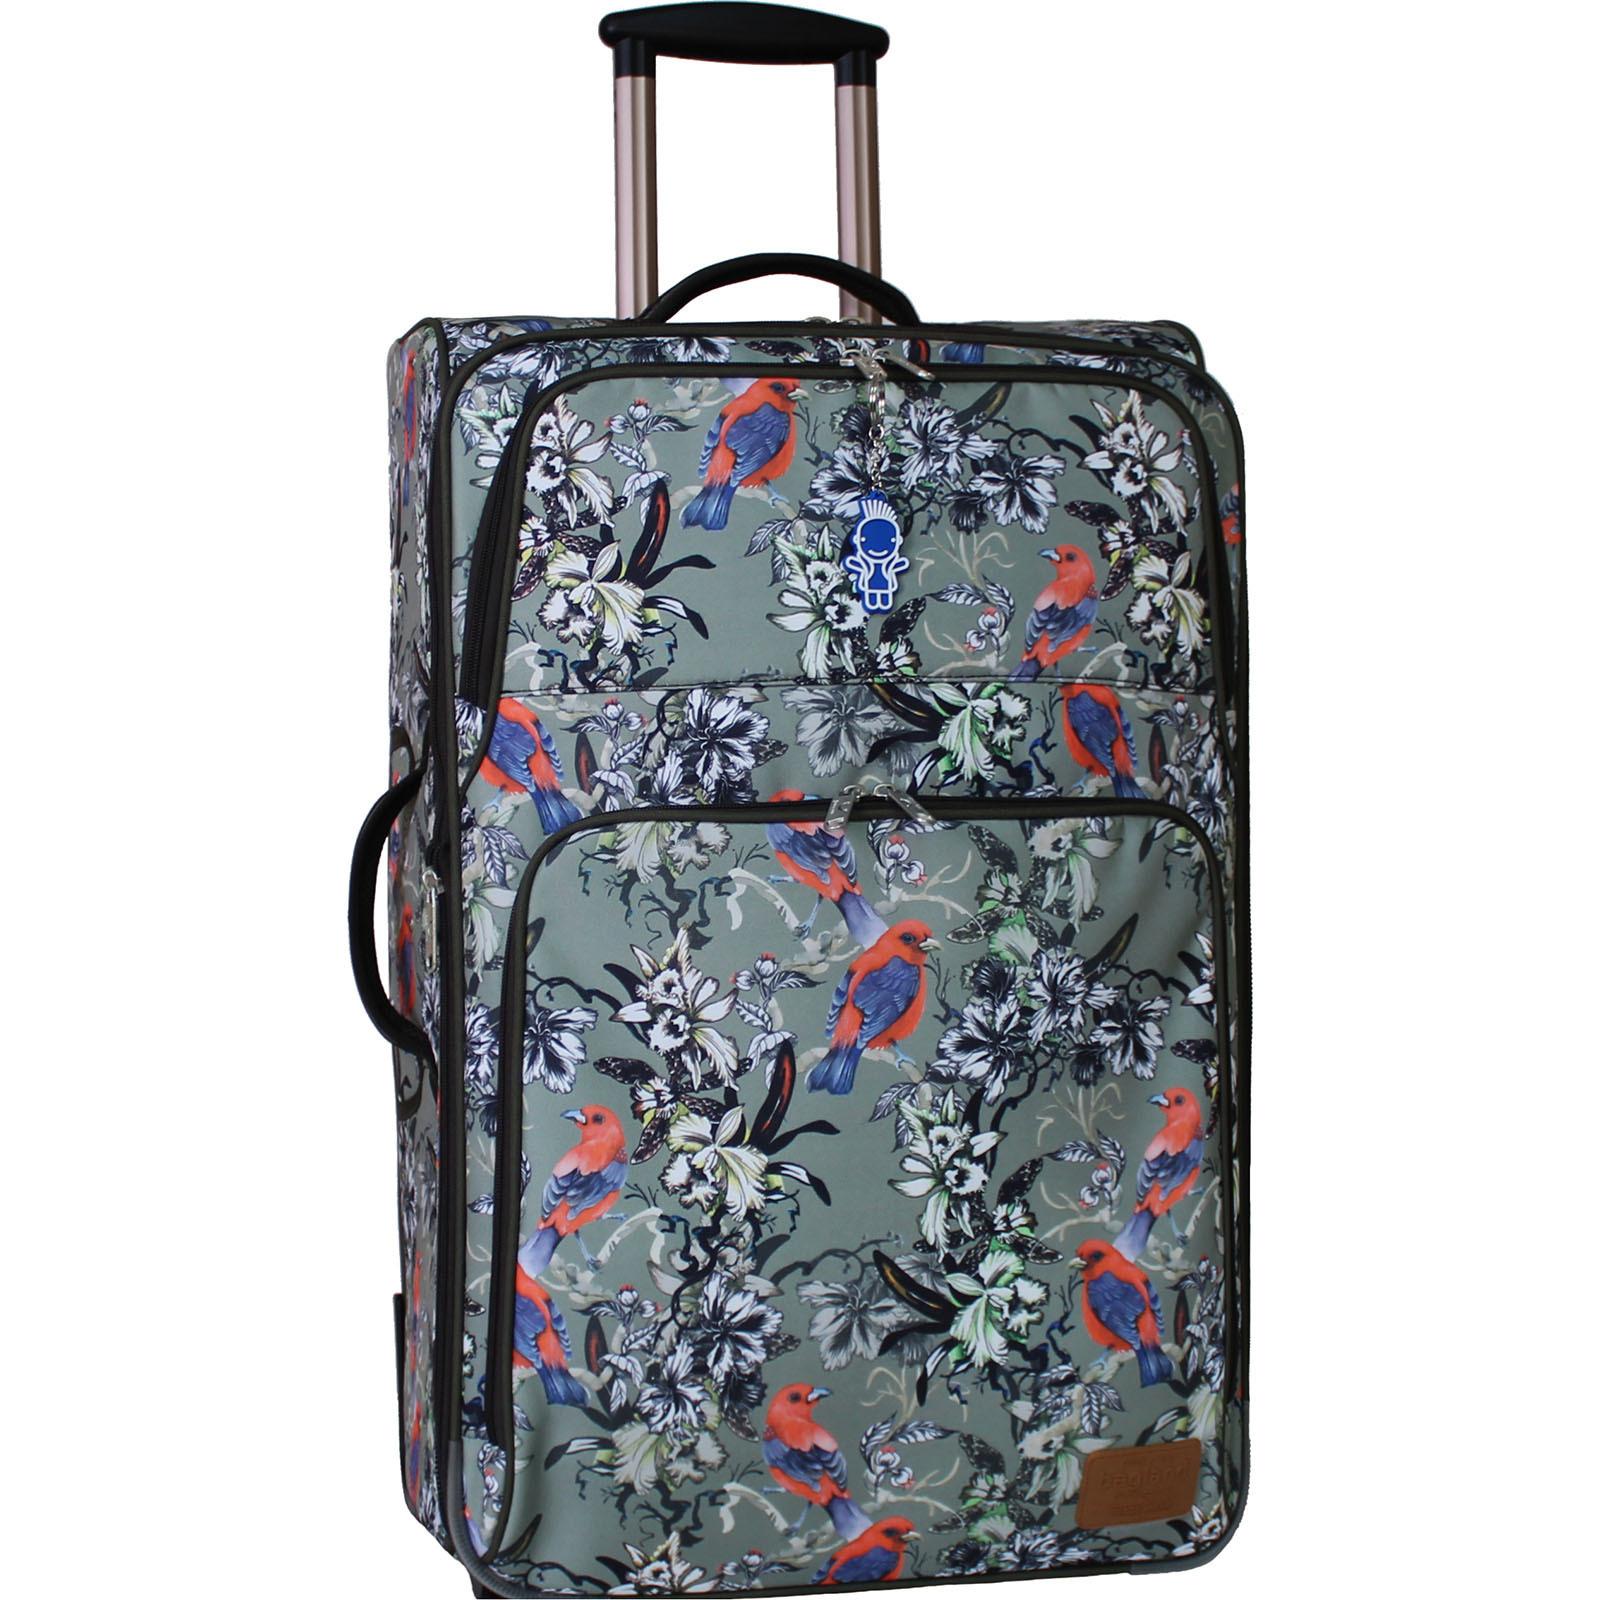 Дорожные чемоданы Чемодан Bagland Леон большой дизайн 70 л. сублімація 178 (0037666274) IMG_9884.JPG